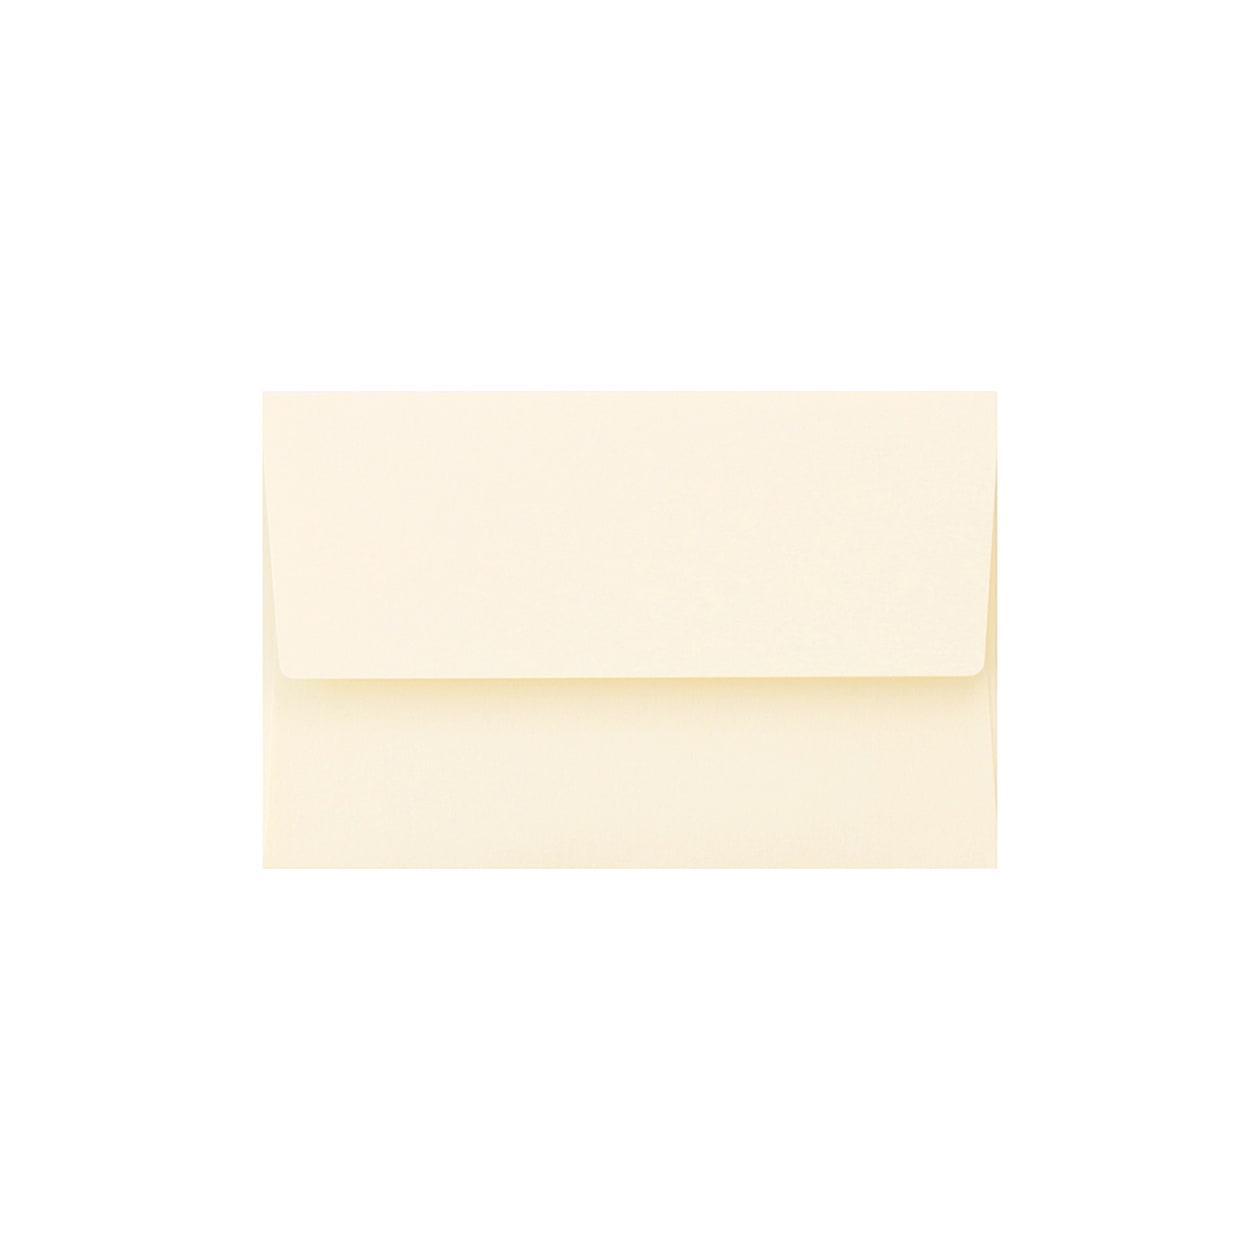 NEカマス封筒 コットン ナチュラル 116.3g